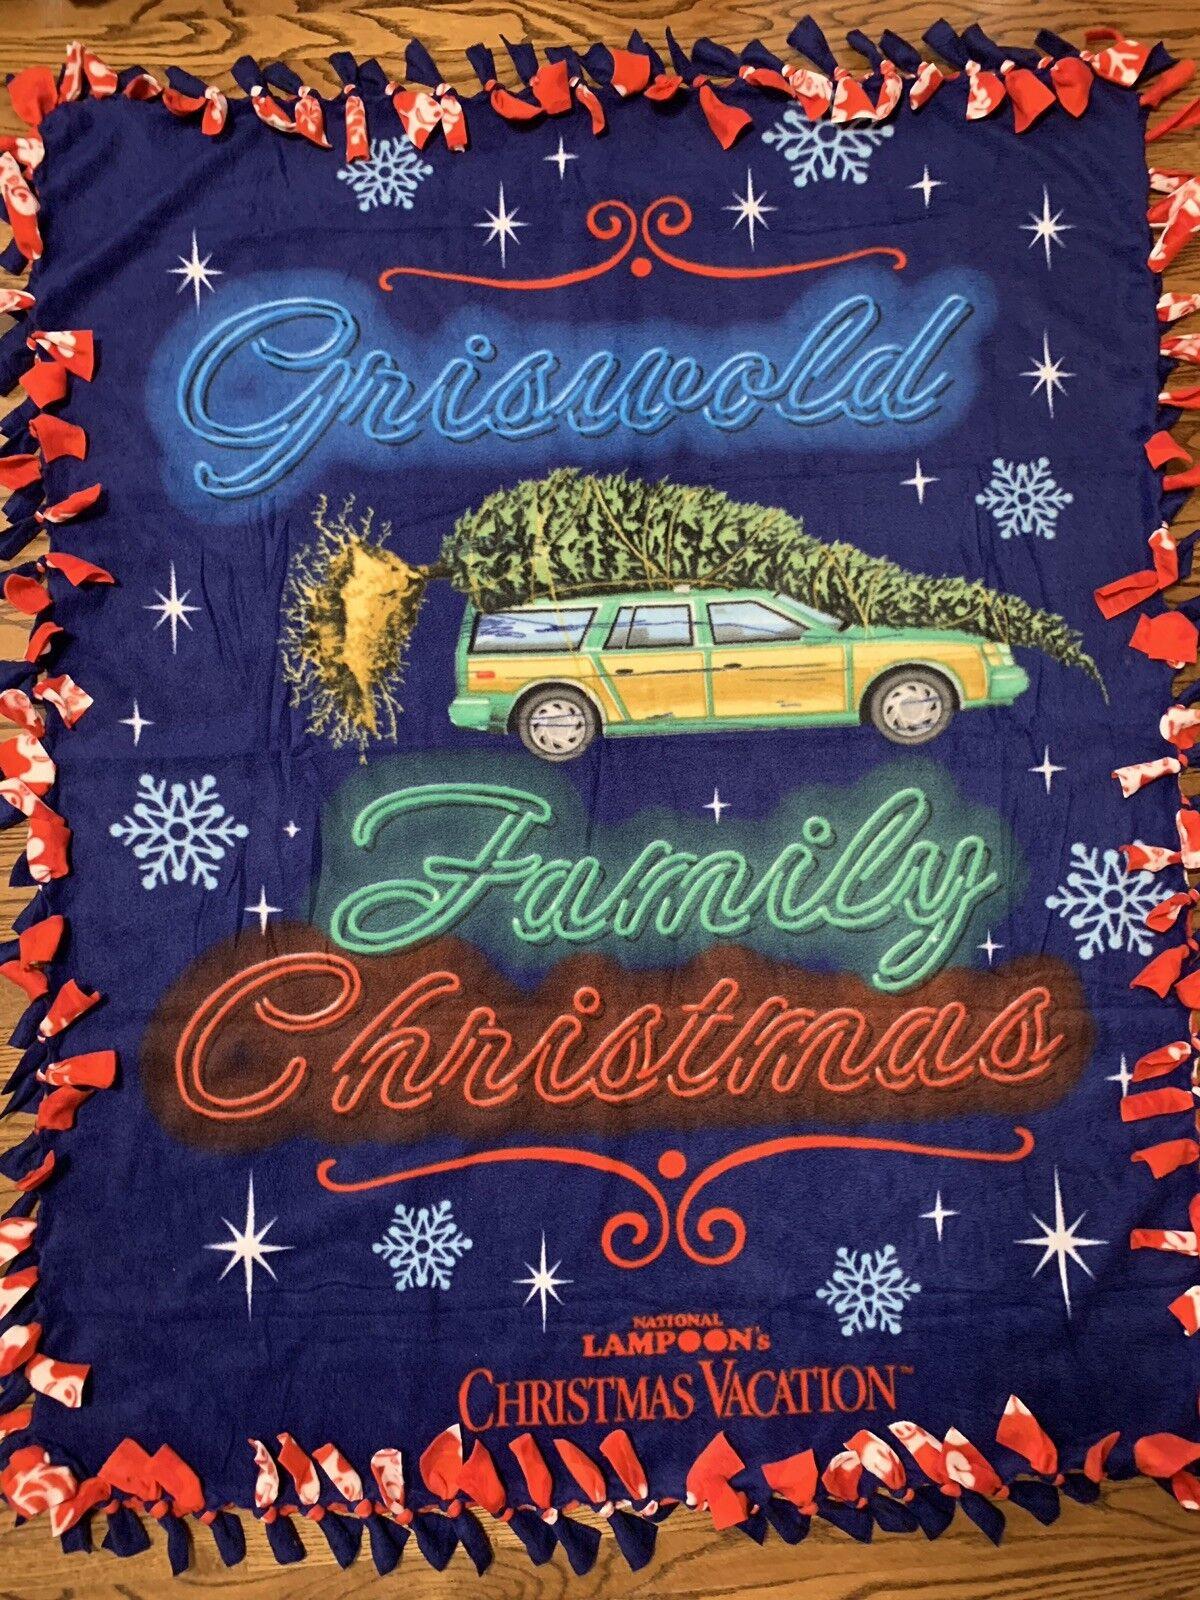 National Lampoons Christmas Vacation Fleece Tie Blanket